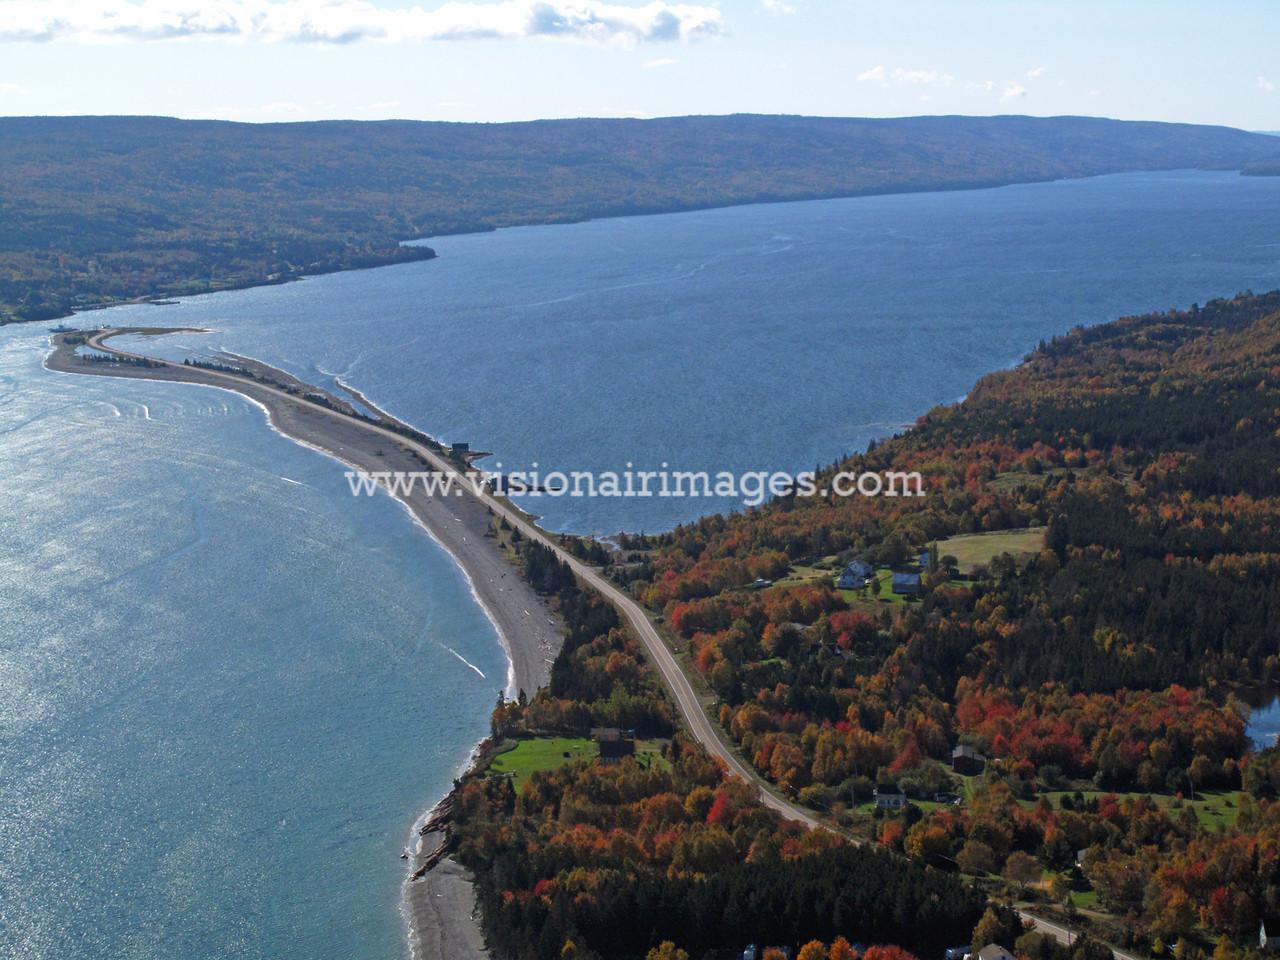 312, Dalem Lake, Nova Scotia, Canada